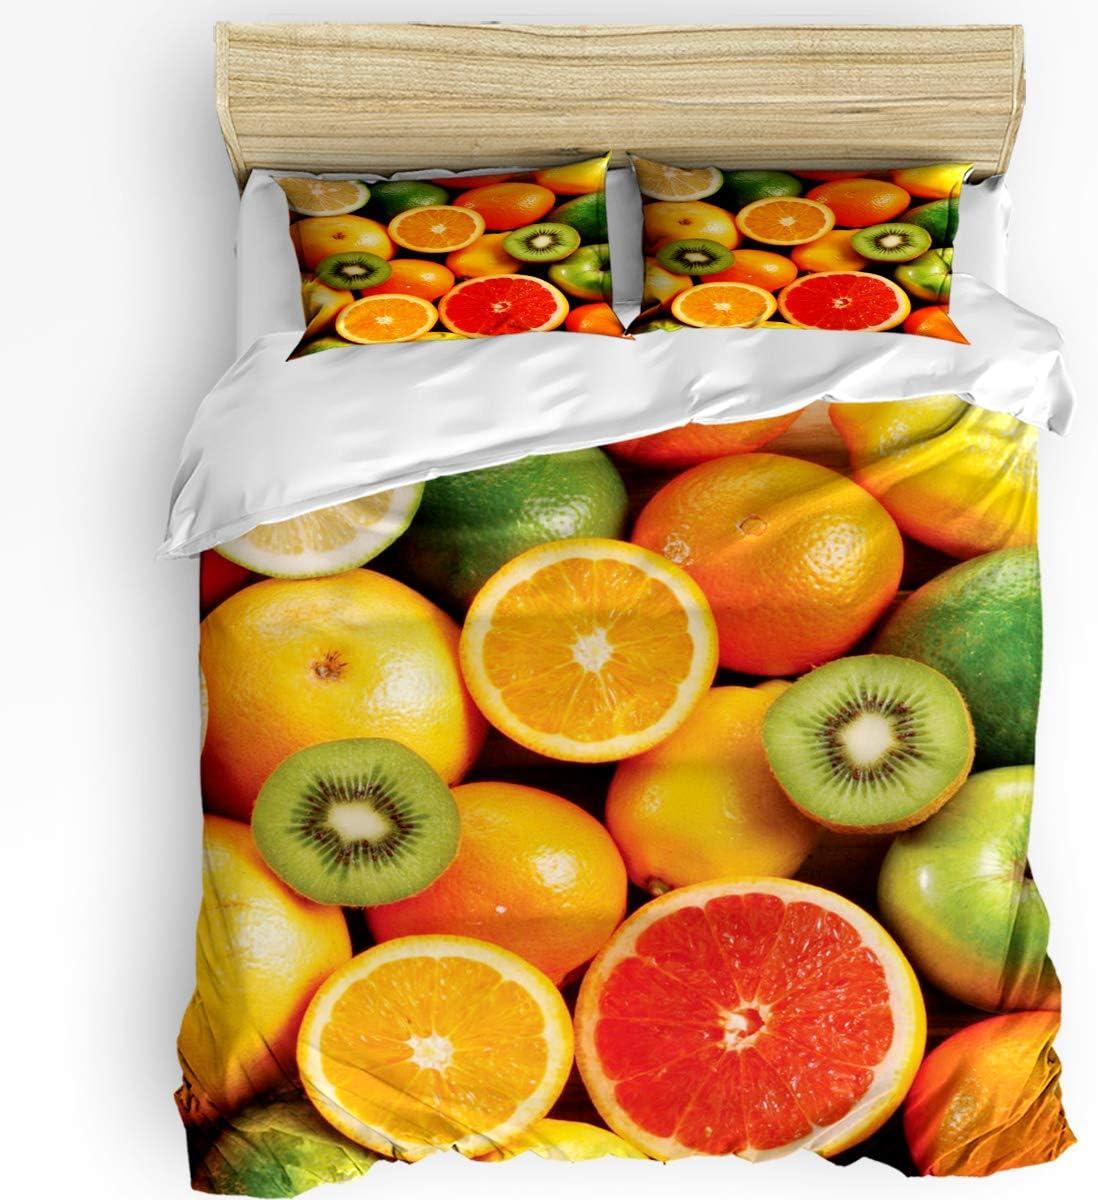 HELLOWINK Duvet Cover 3 Sales Piece Bedding Kitchen Size Set Queen Finally resale start Co